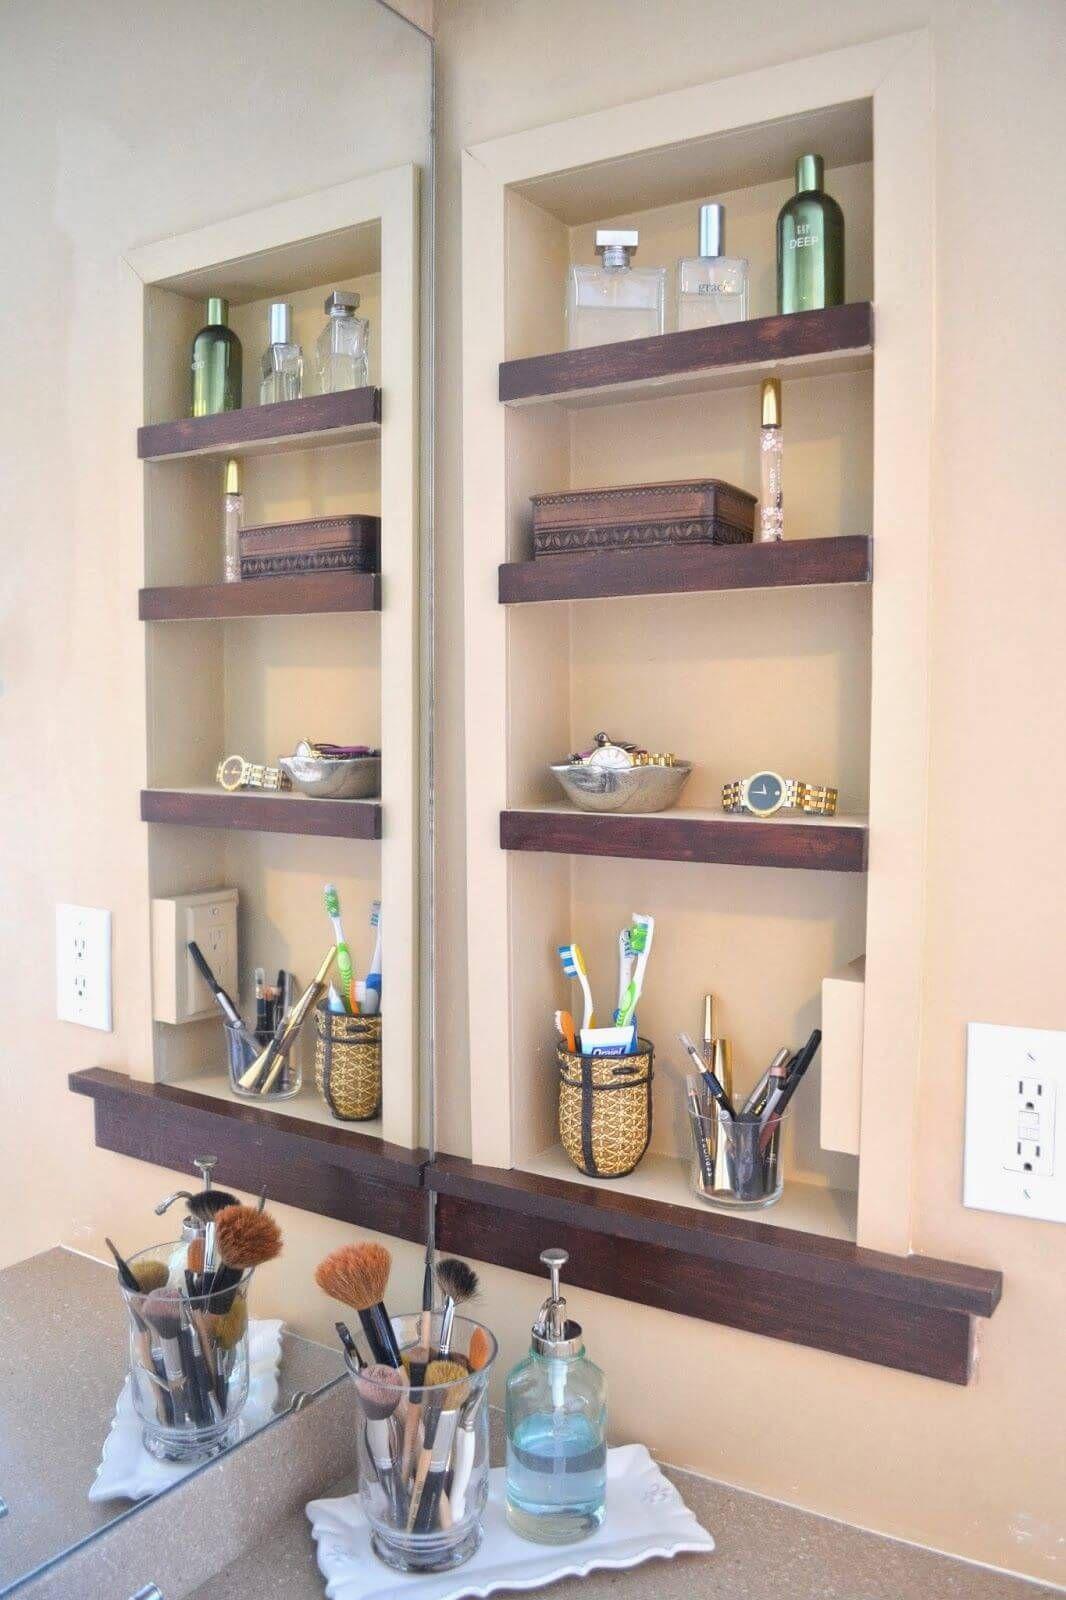 25 Brilliant Built In Bathroom Shelf And Storage Ideas To Keep You Organized With Style Bathroom Shelf Decor Bathrooms Remodel Small Bathroom